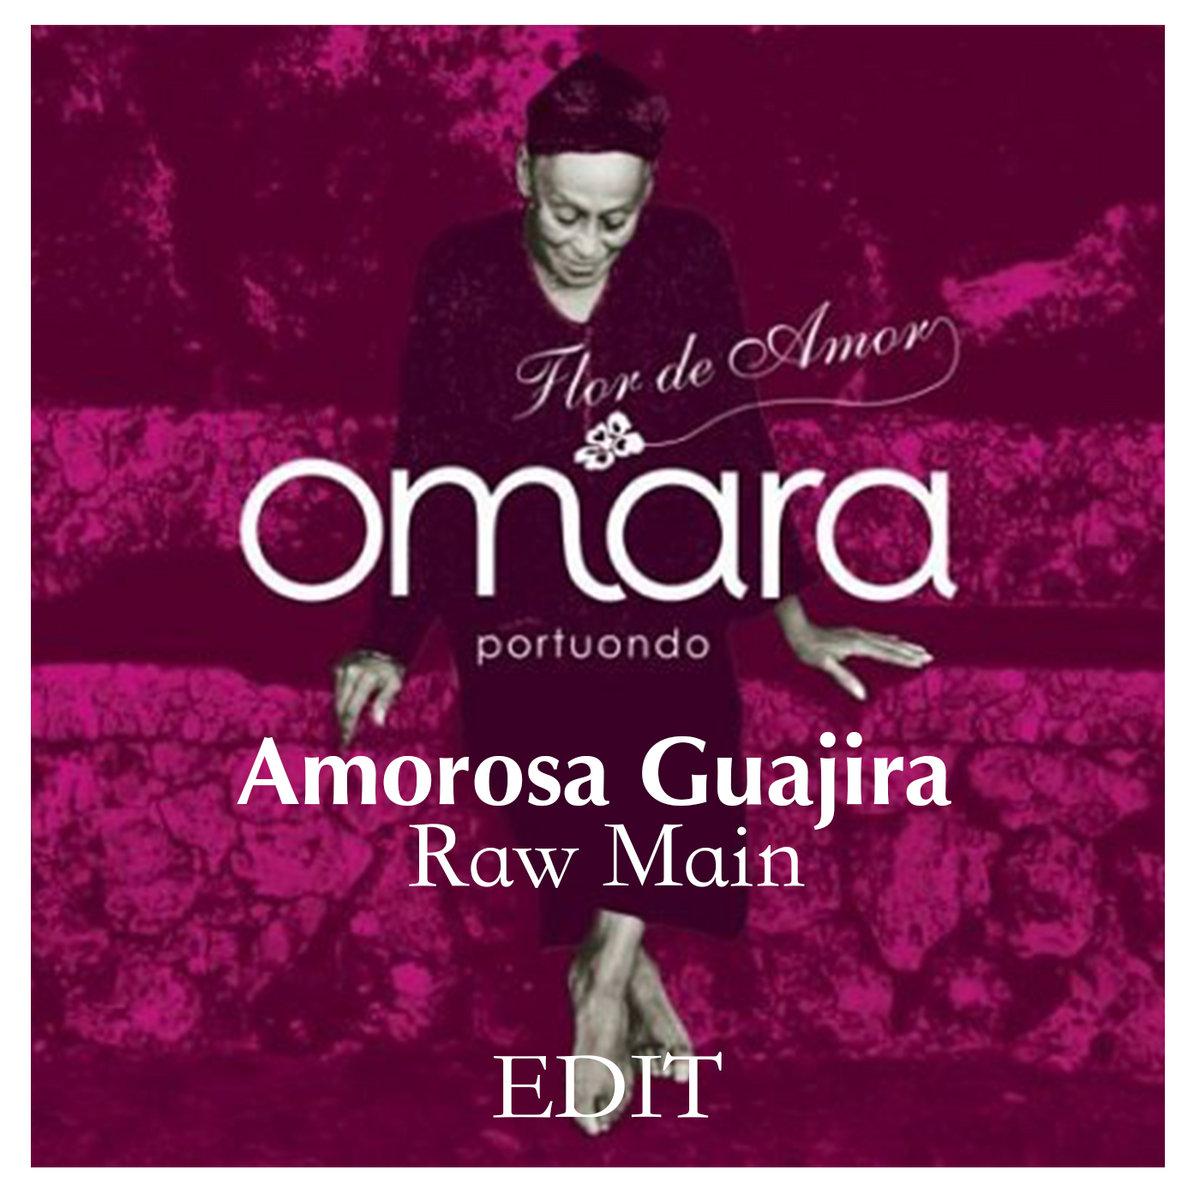 Omara Portuondo - Amorosa Guajira (Raw Main Edit)